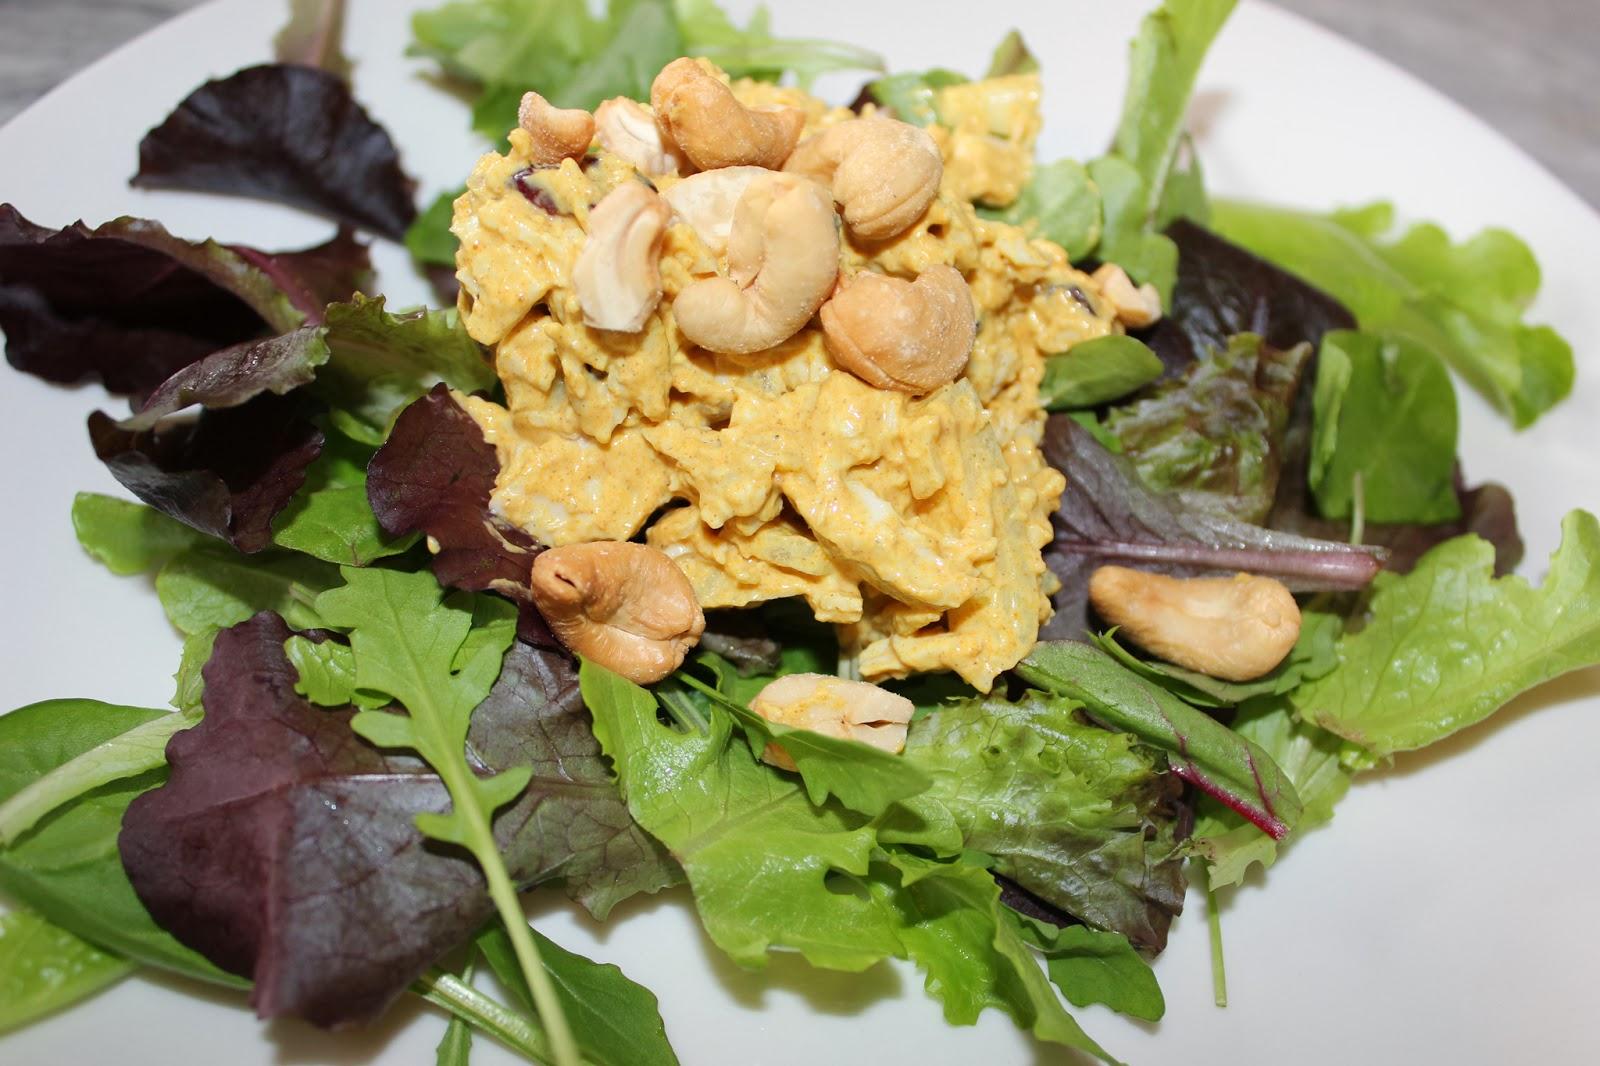 aMUSEing: Curried Turkey Salad